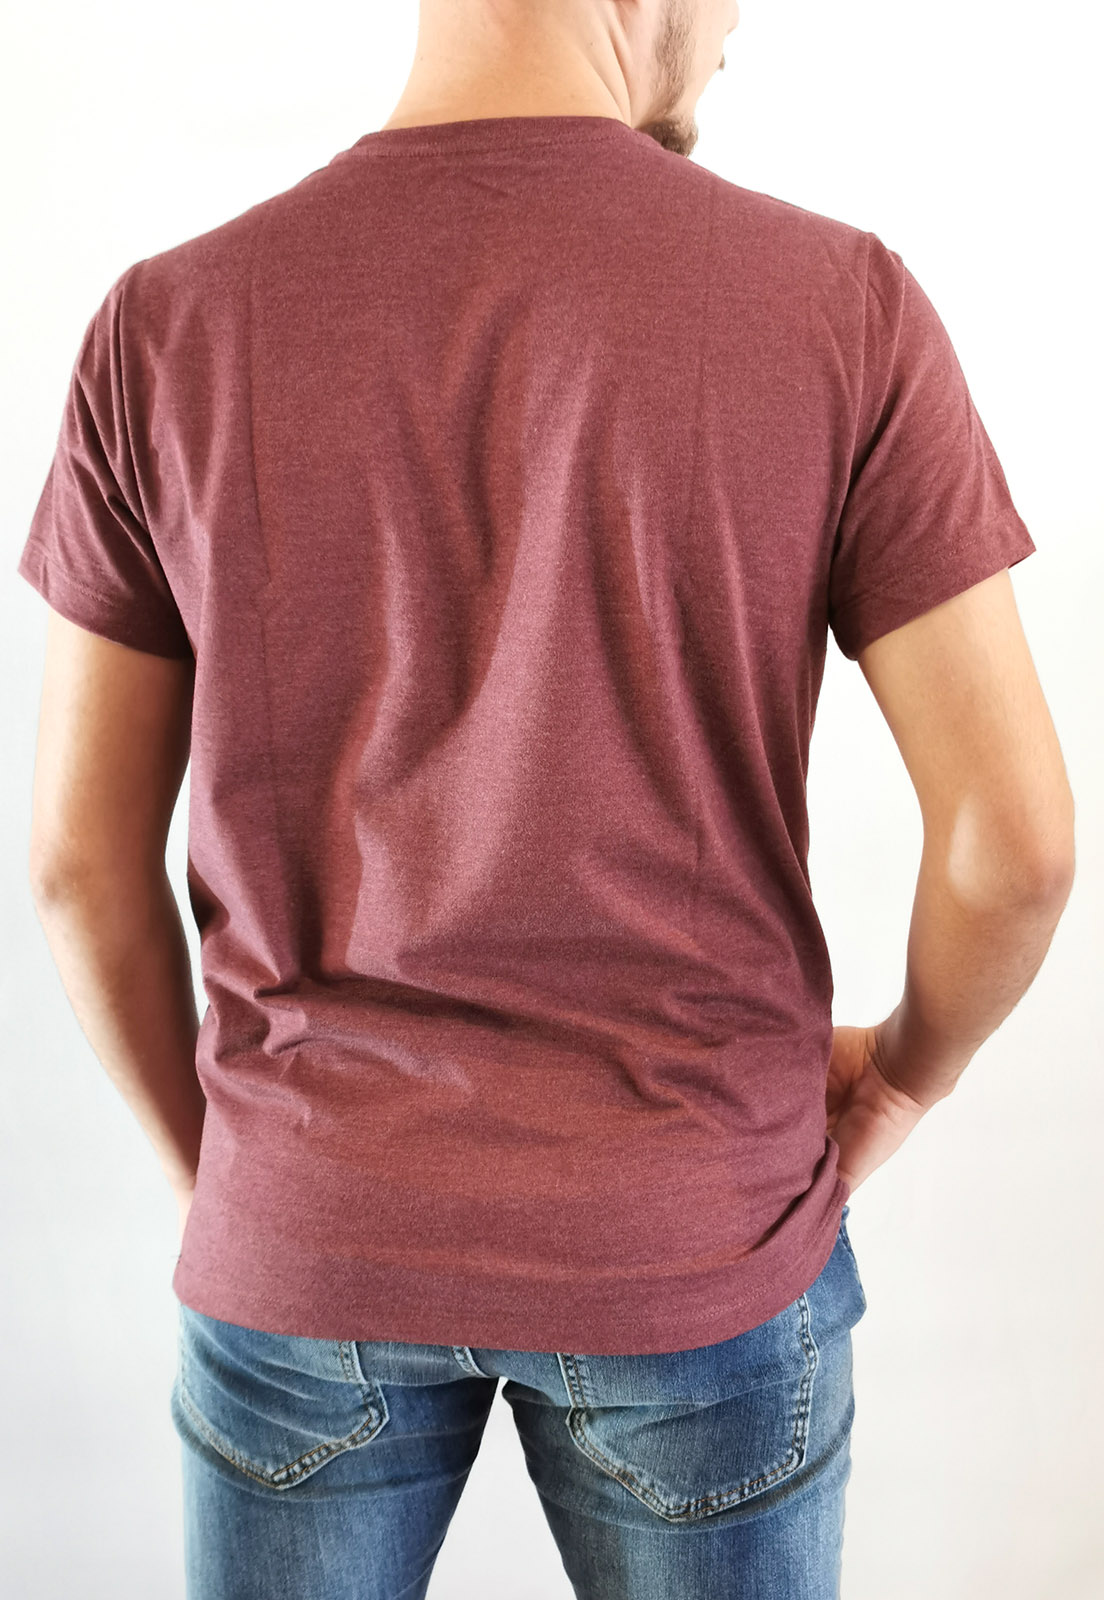 Camiseta Aéropostale Mescla Bordô Básica